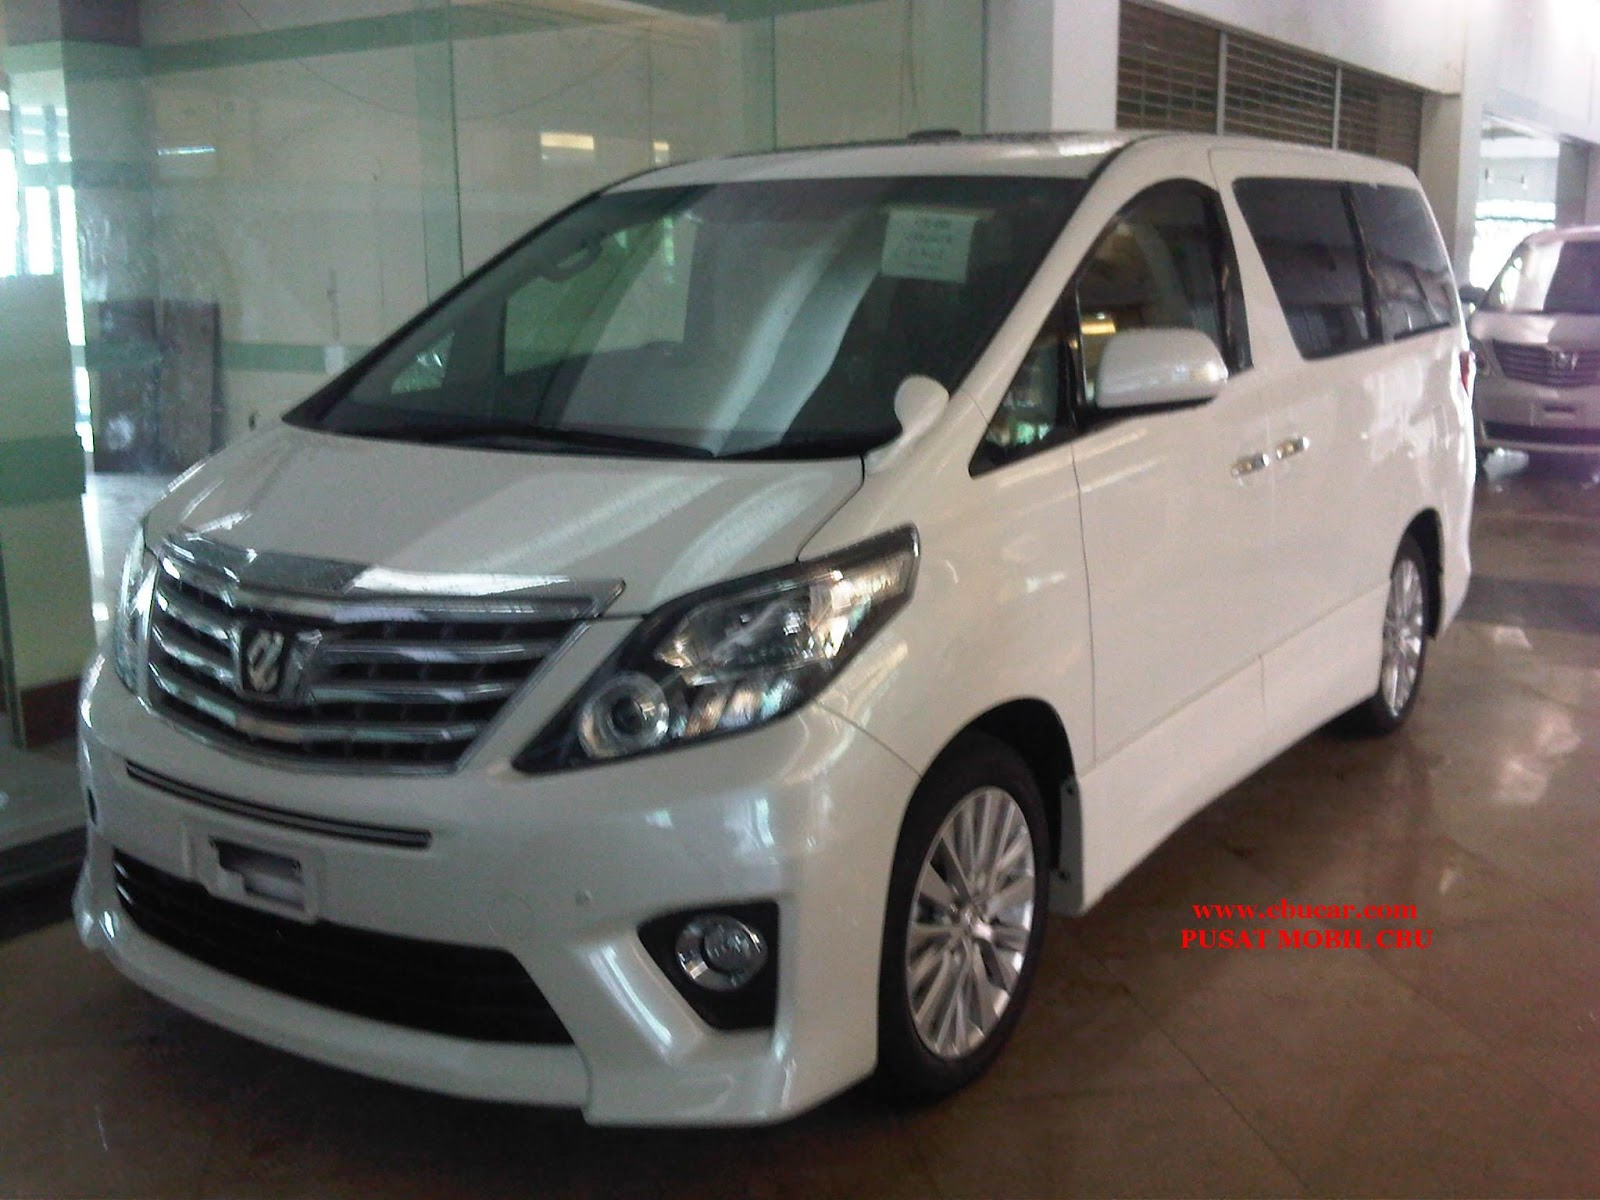 All New Alphard 2021 Harga Kijang Innova Bekas Toyota Facelift 2014 Mobil Baru Cbu